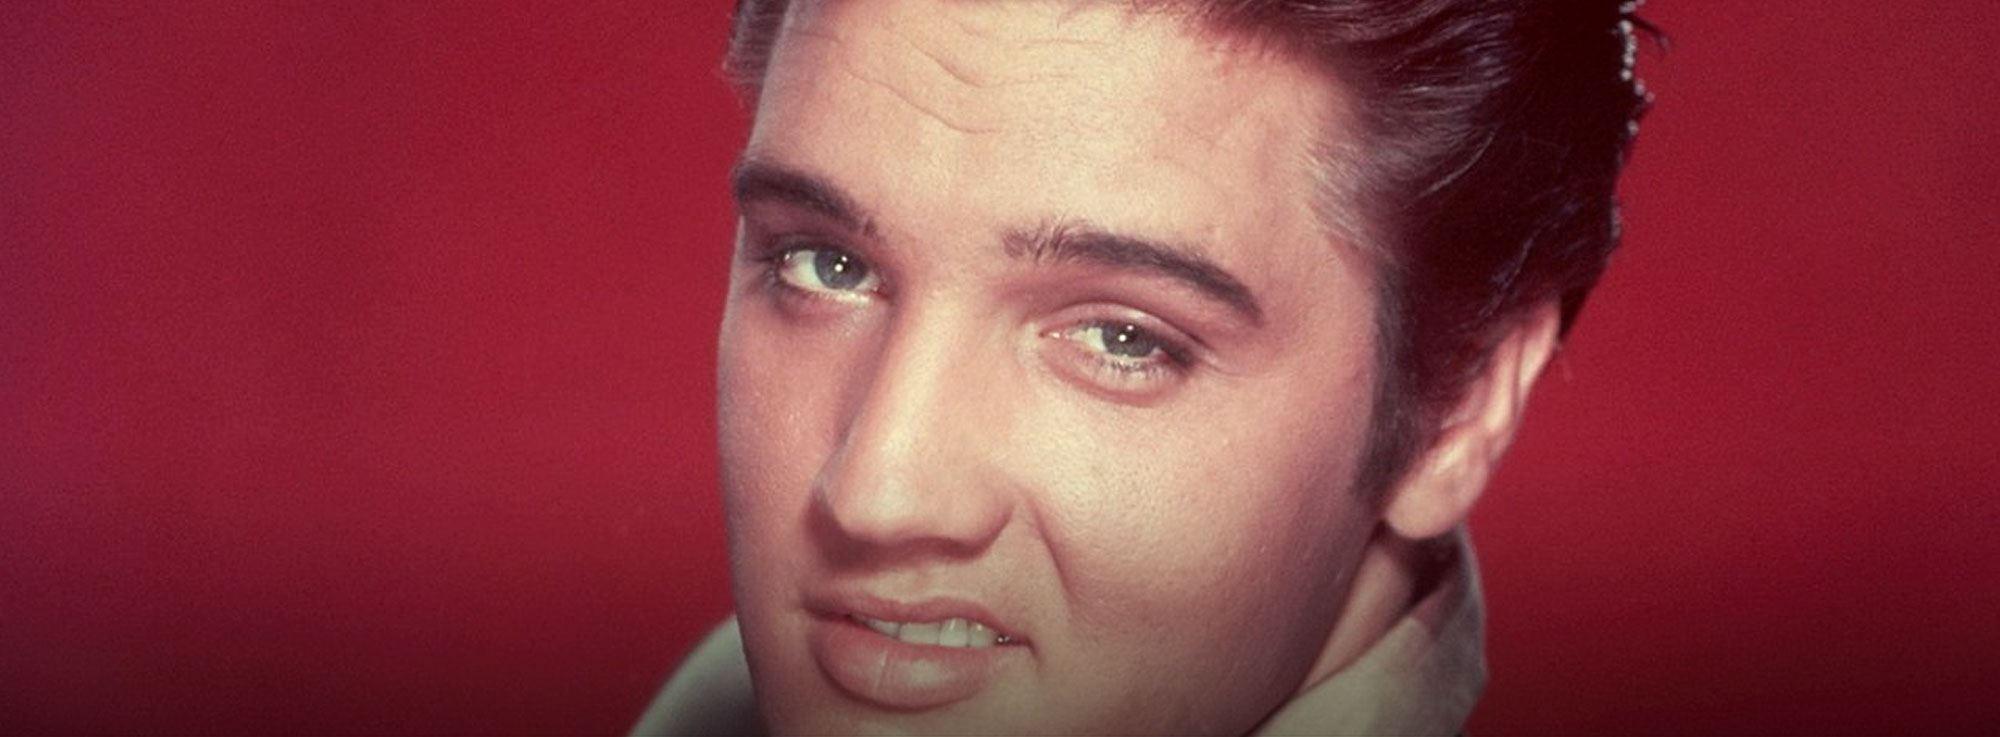 Bari: Elvis the musical